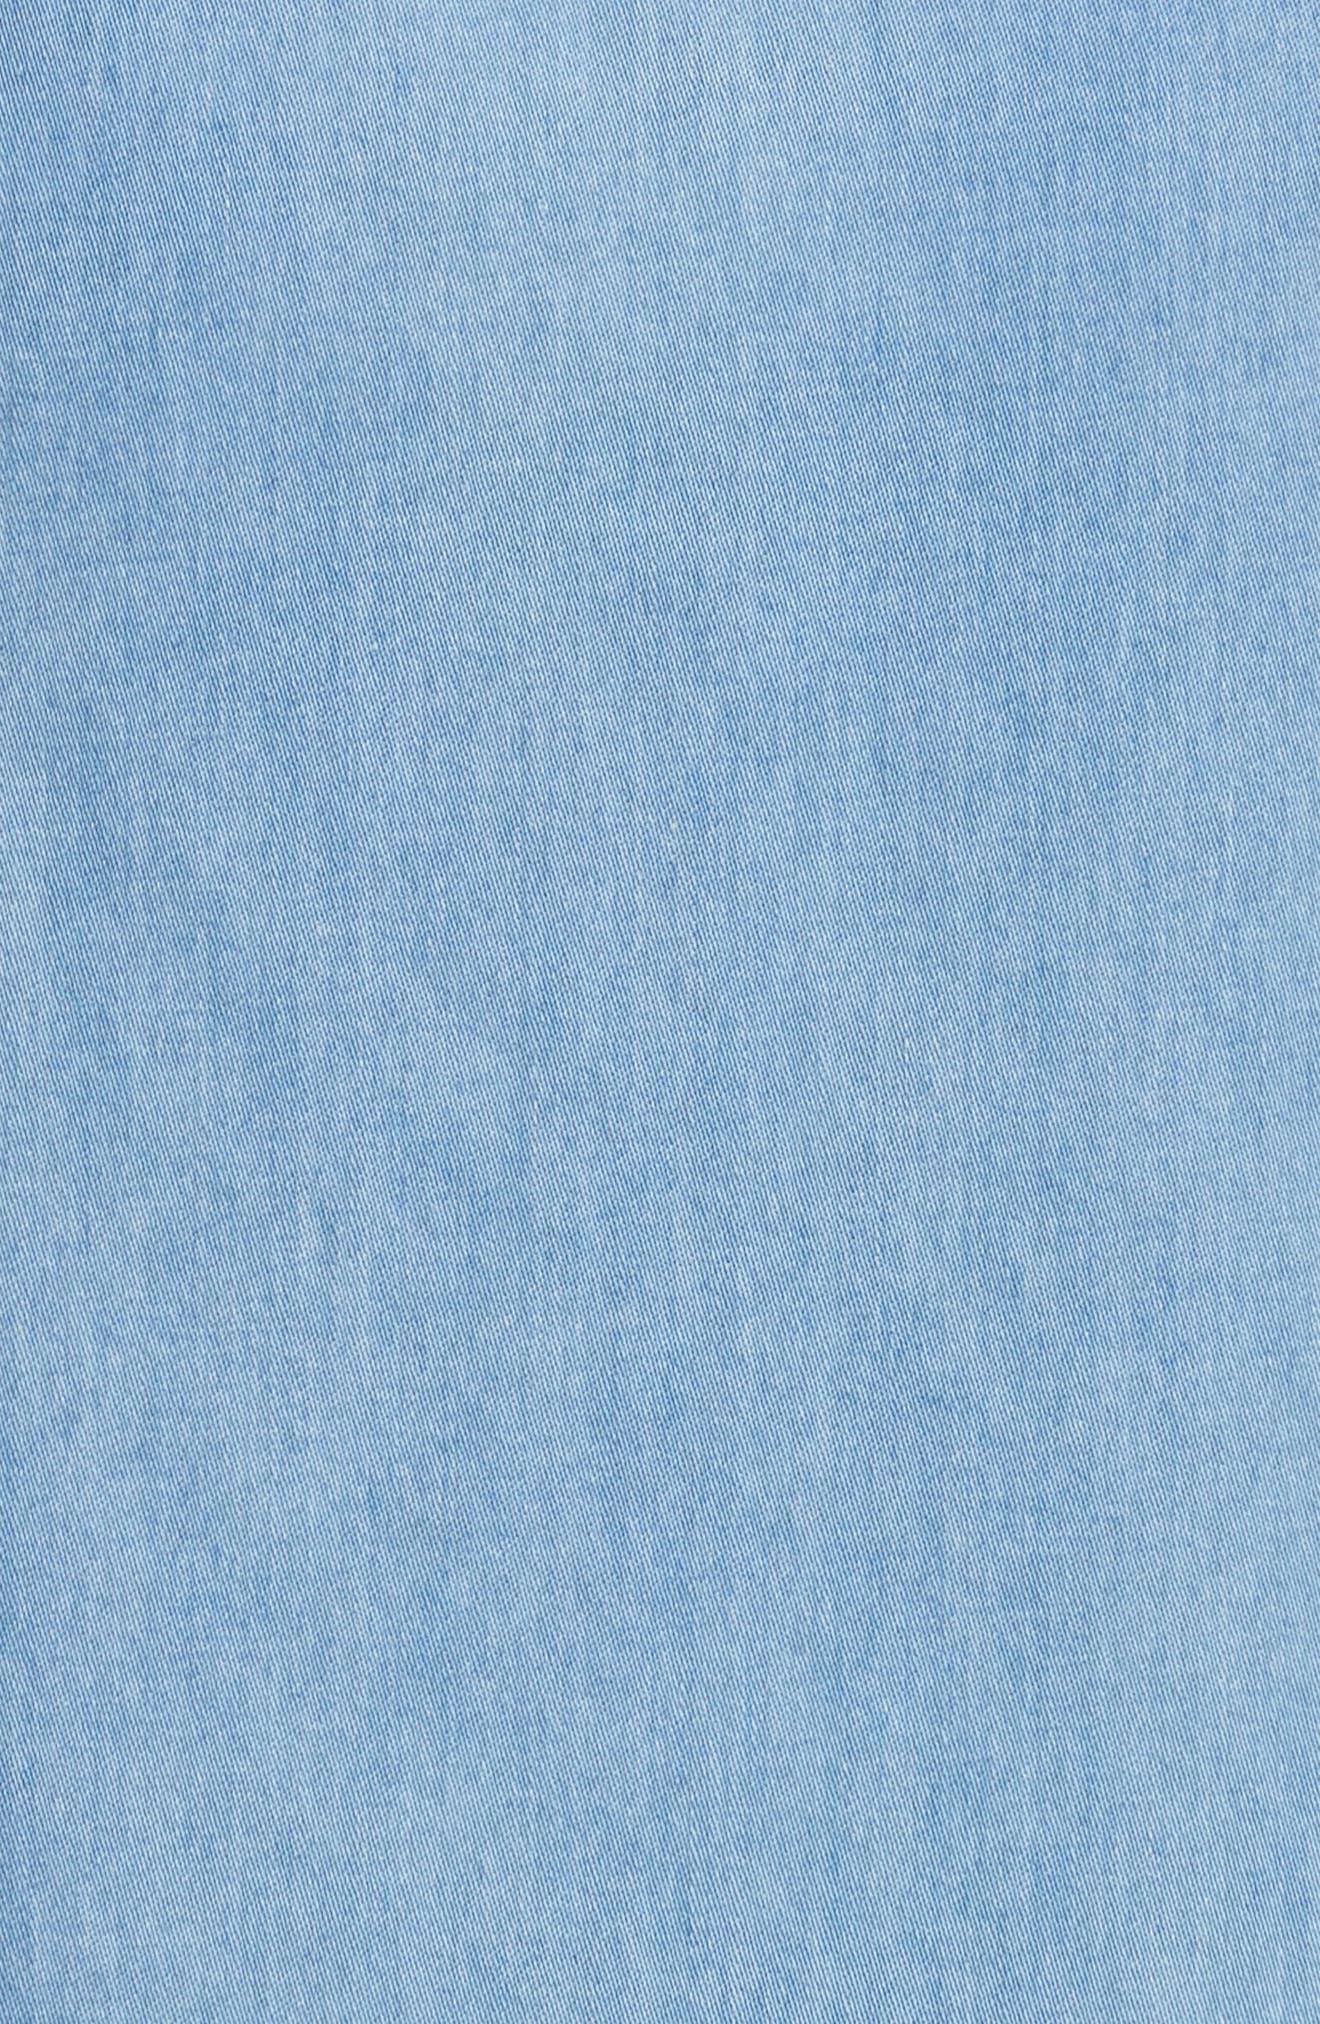 Peekaboo Chambray Midi Dress,                             Alternate thumbnail 5, color,                             421